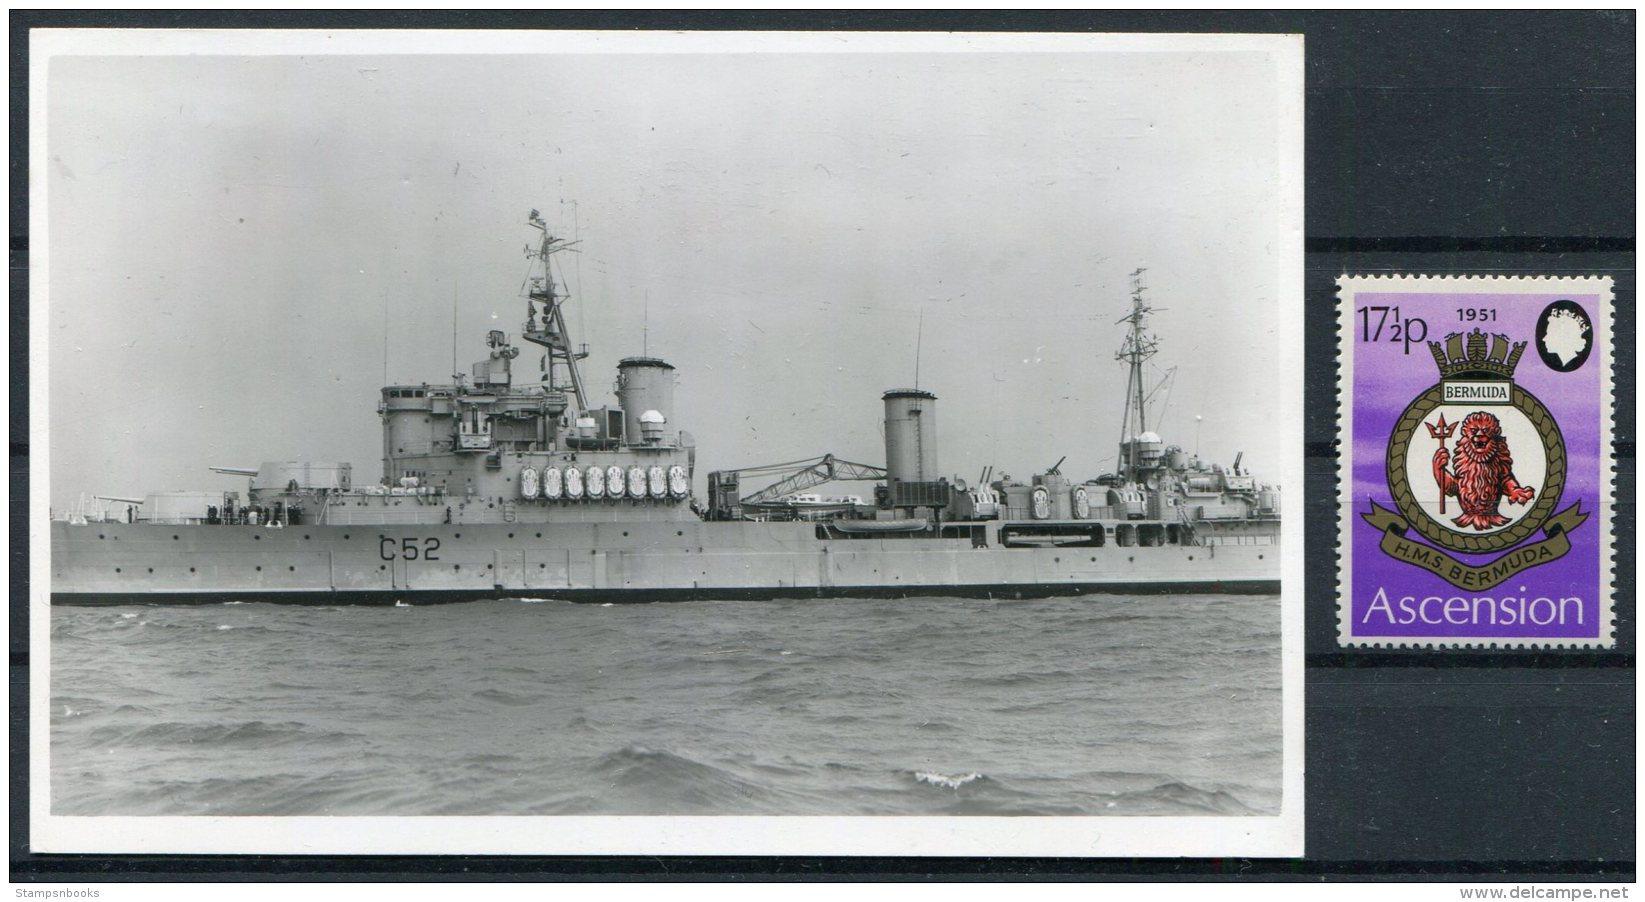 H.M.S. BERMUDA R.P. Postcard (plain Back) Royal Navy Ship + Ascension Stamp - Warships